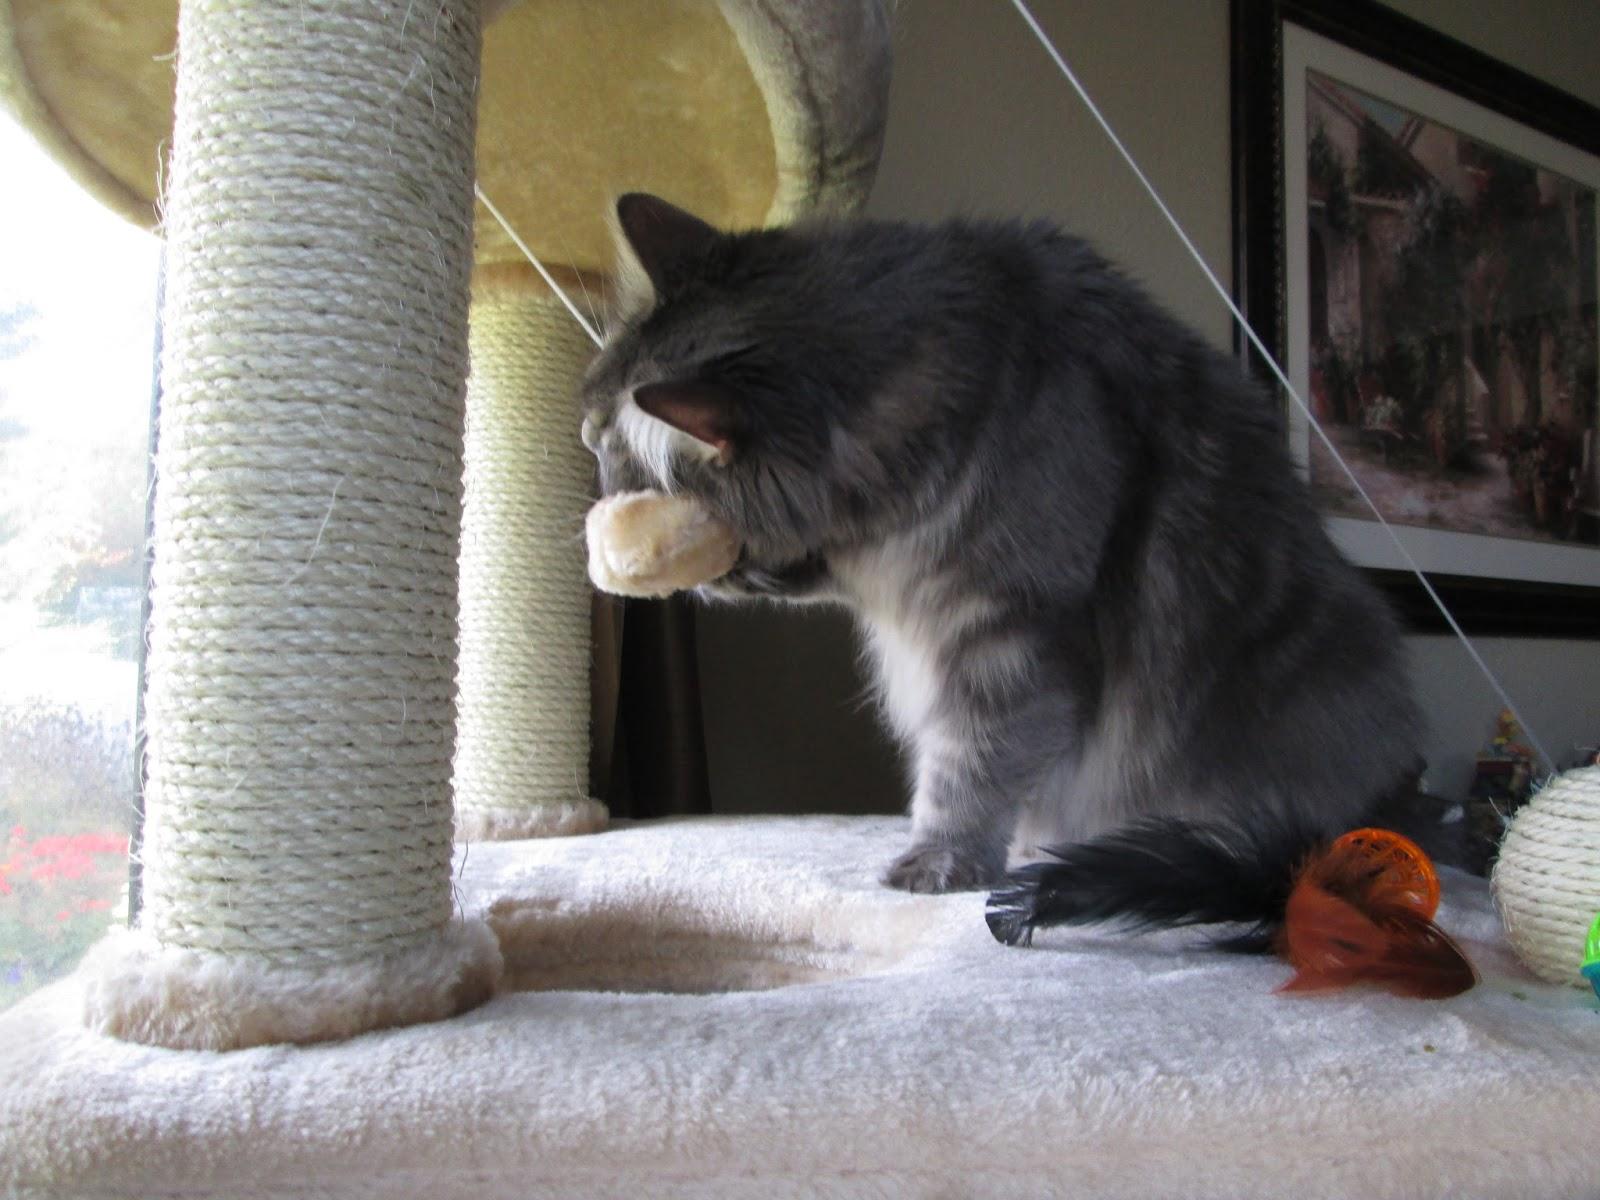 Happy Clean Living Cat Lady Alert